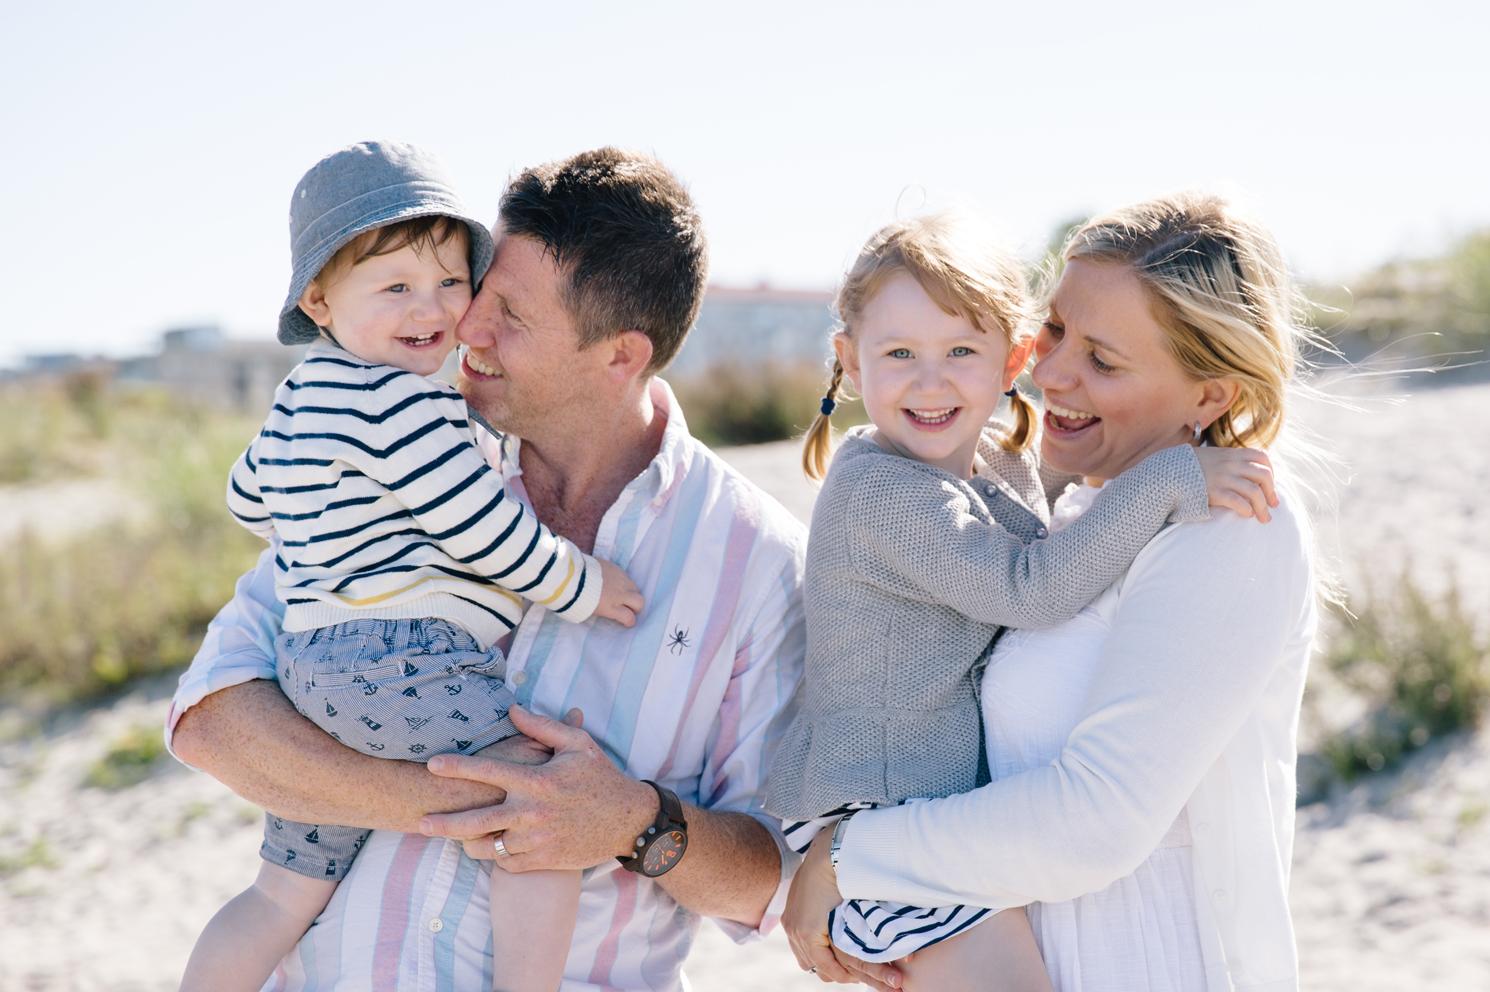 familjefotografering-malmo-kallbadhuset-maria-o-photo-lek-gladje-karlek-1